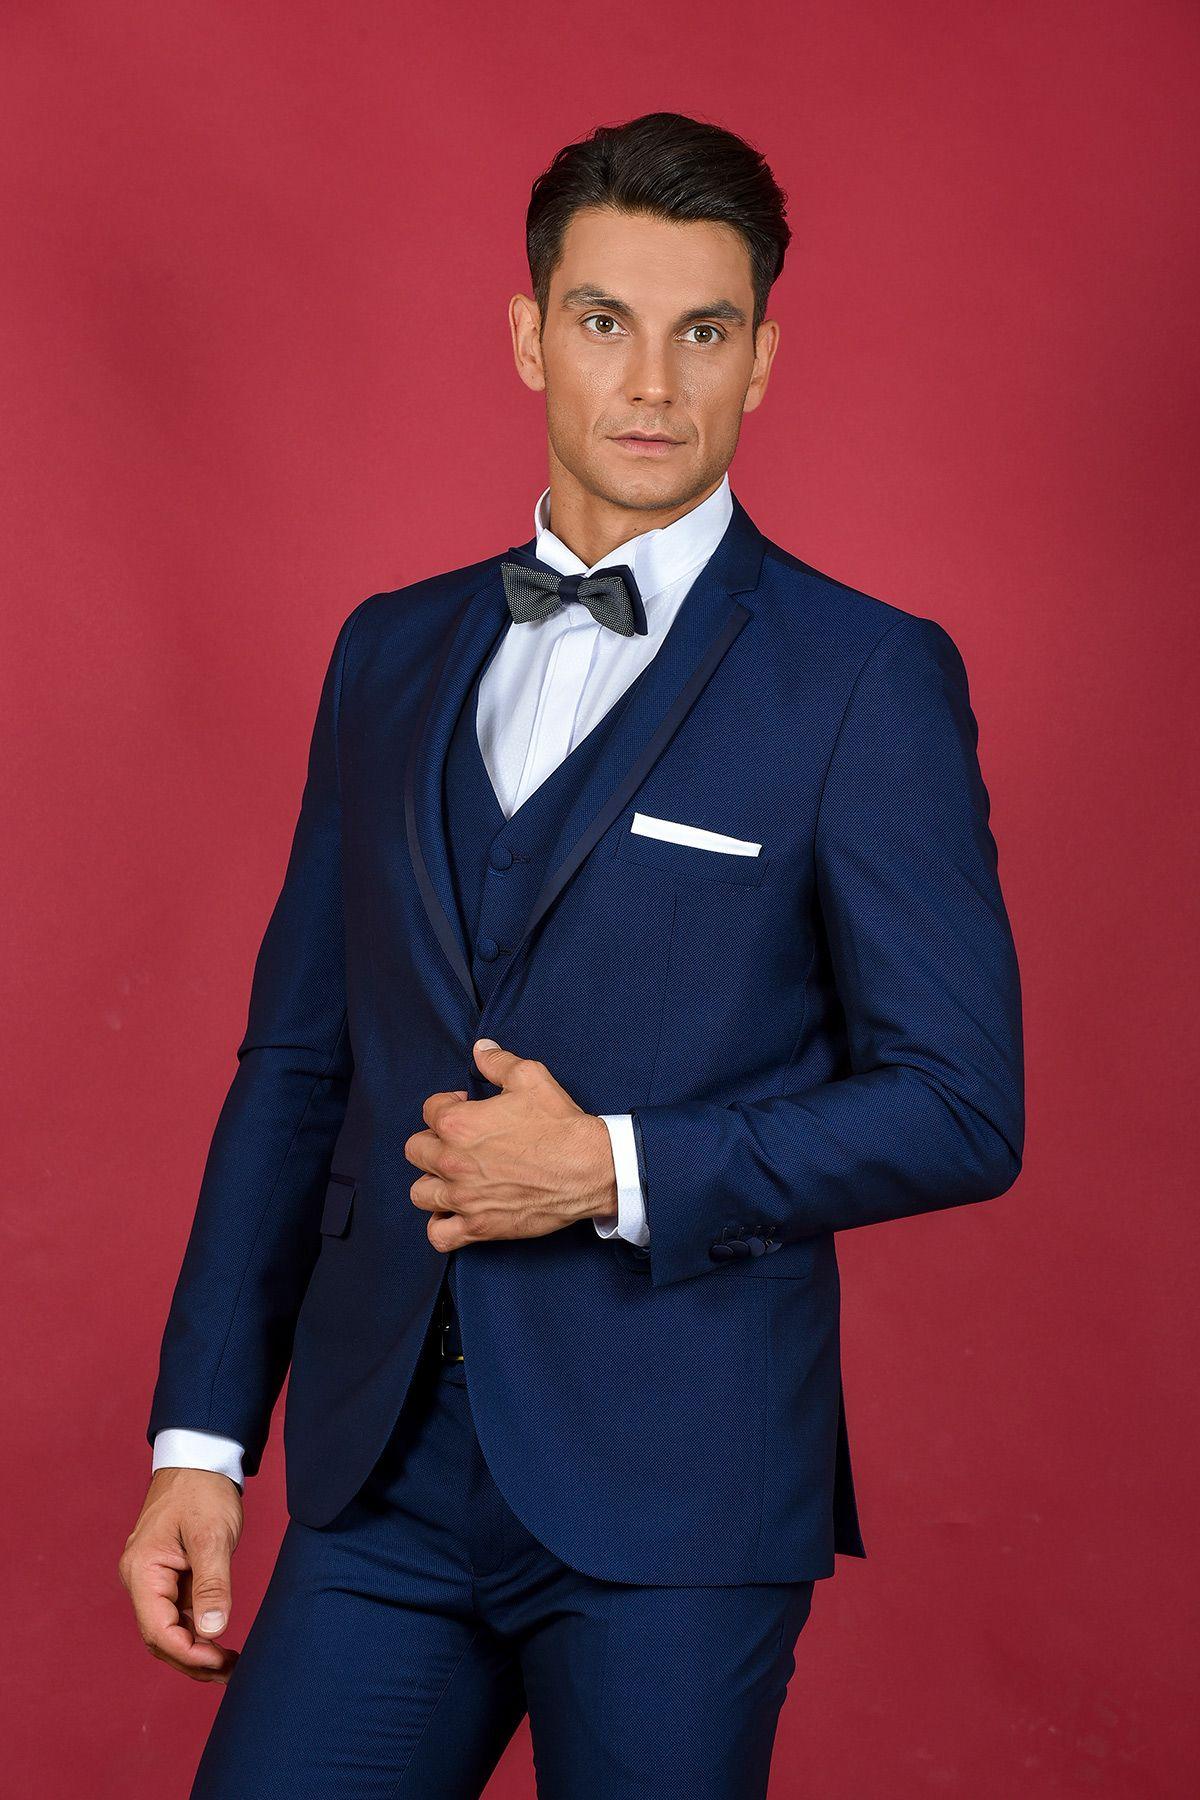 78d66d2e98d3 Γαμπριάτικο κοστούμι μπλε με φάσα σε στενή γραμμή